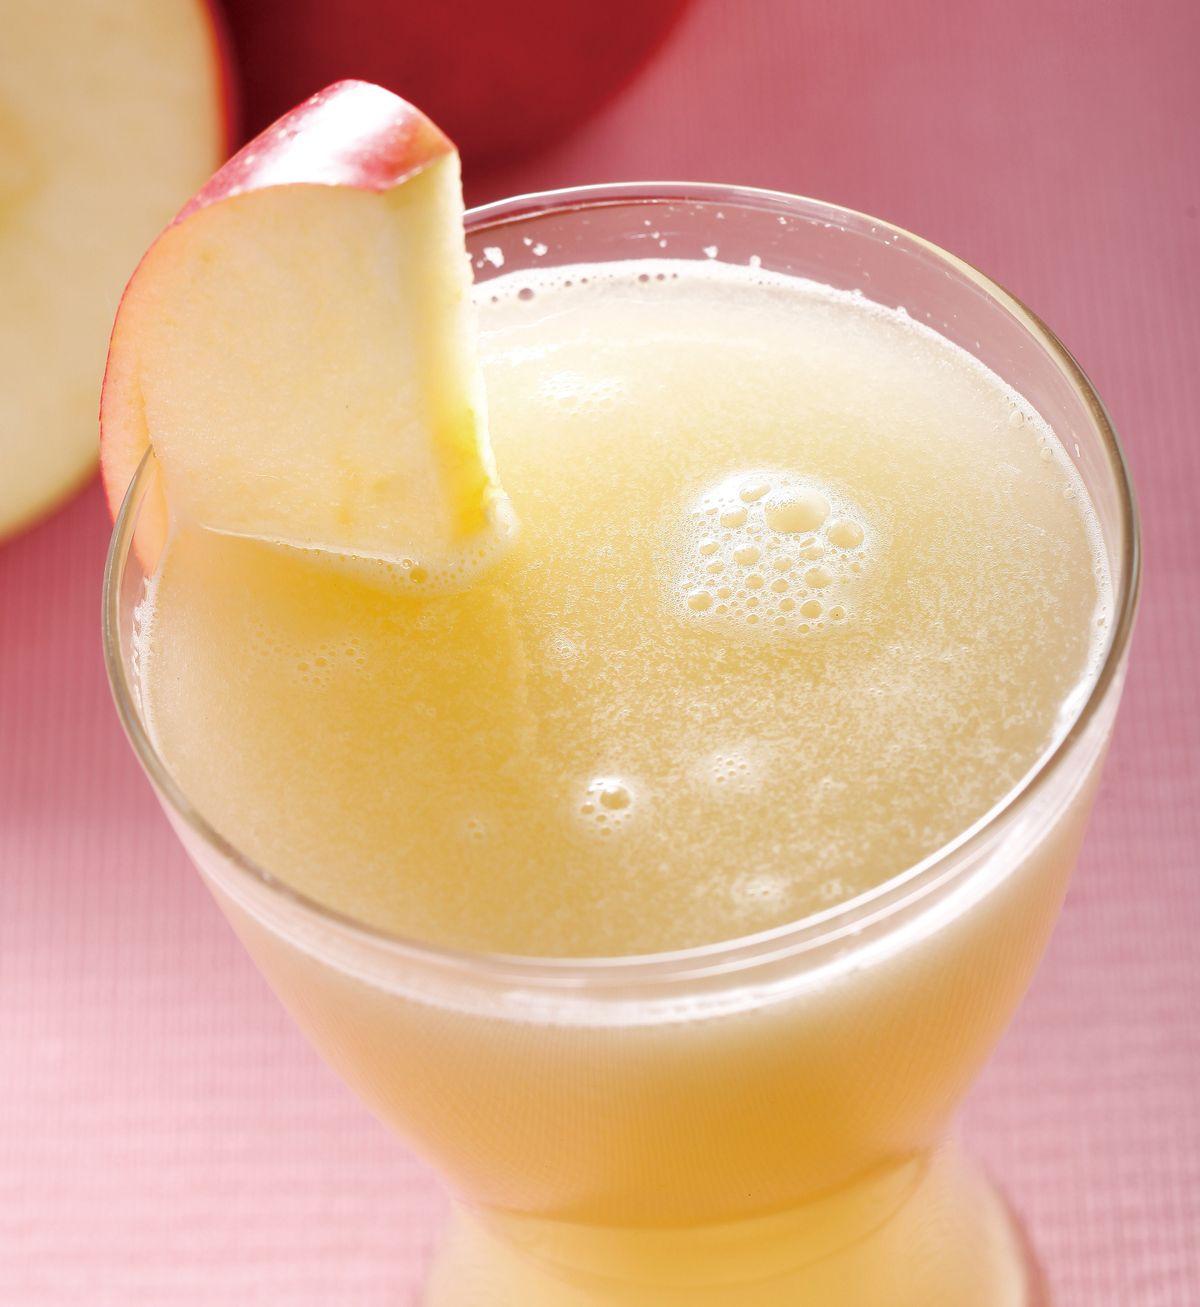 【食譜】蘋果蓮藕茶:www.ytower.com.tw